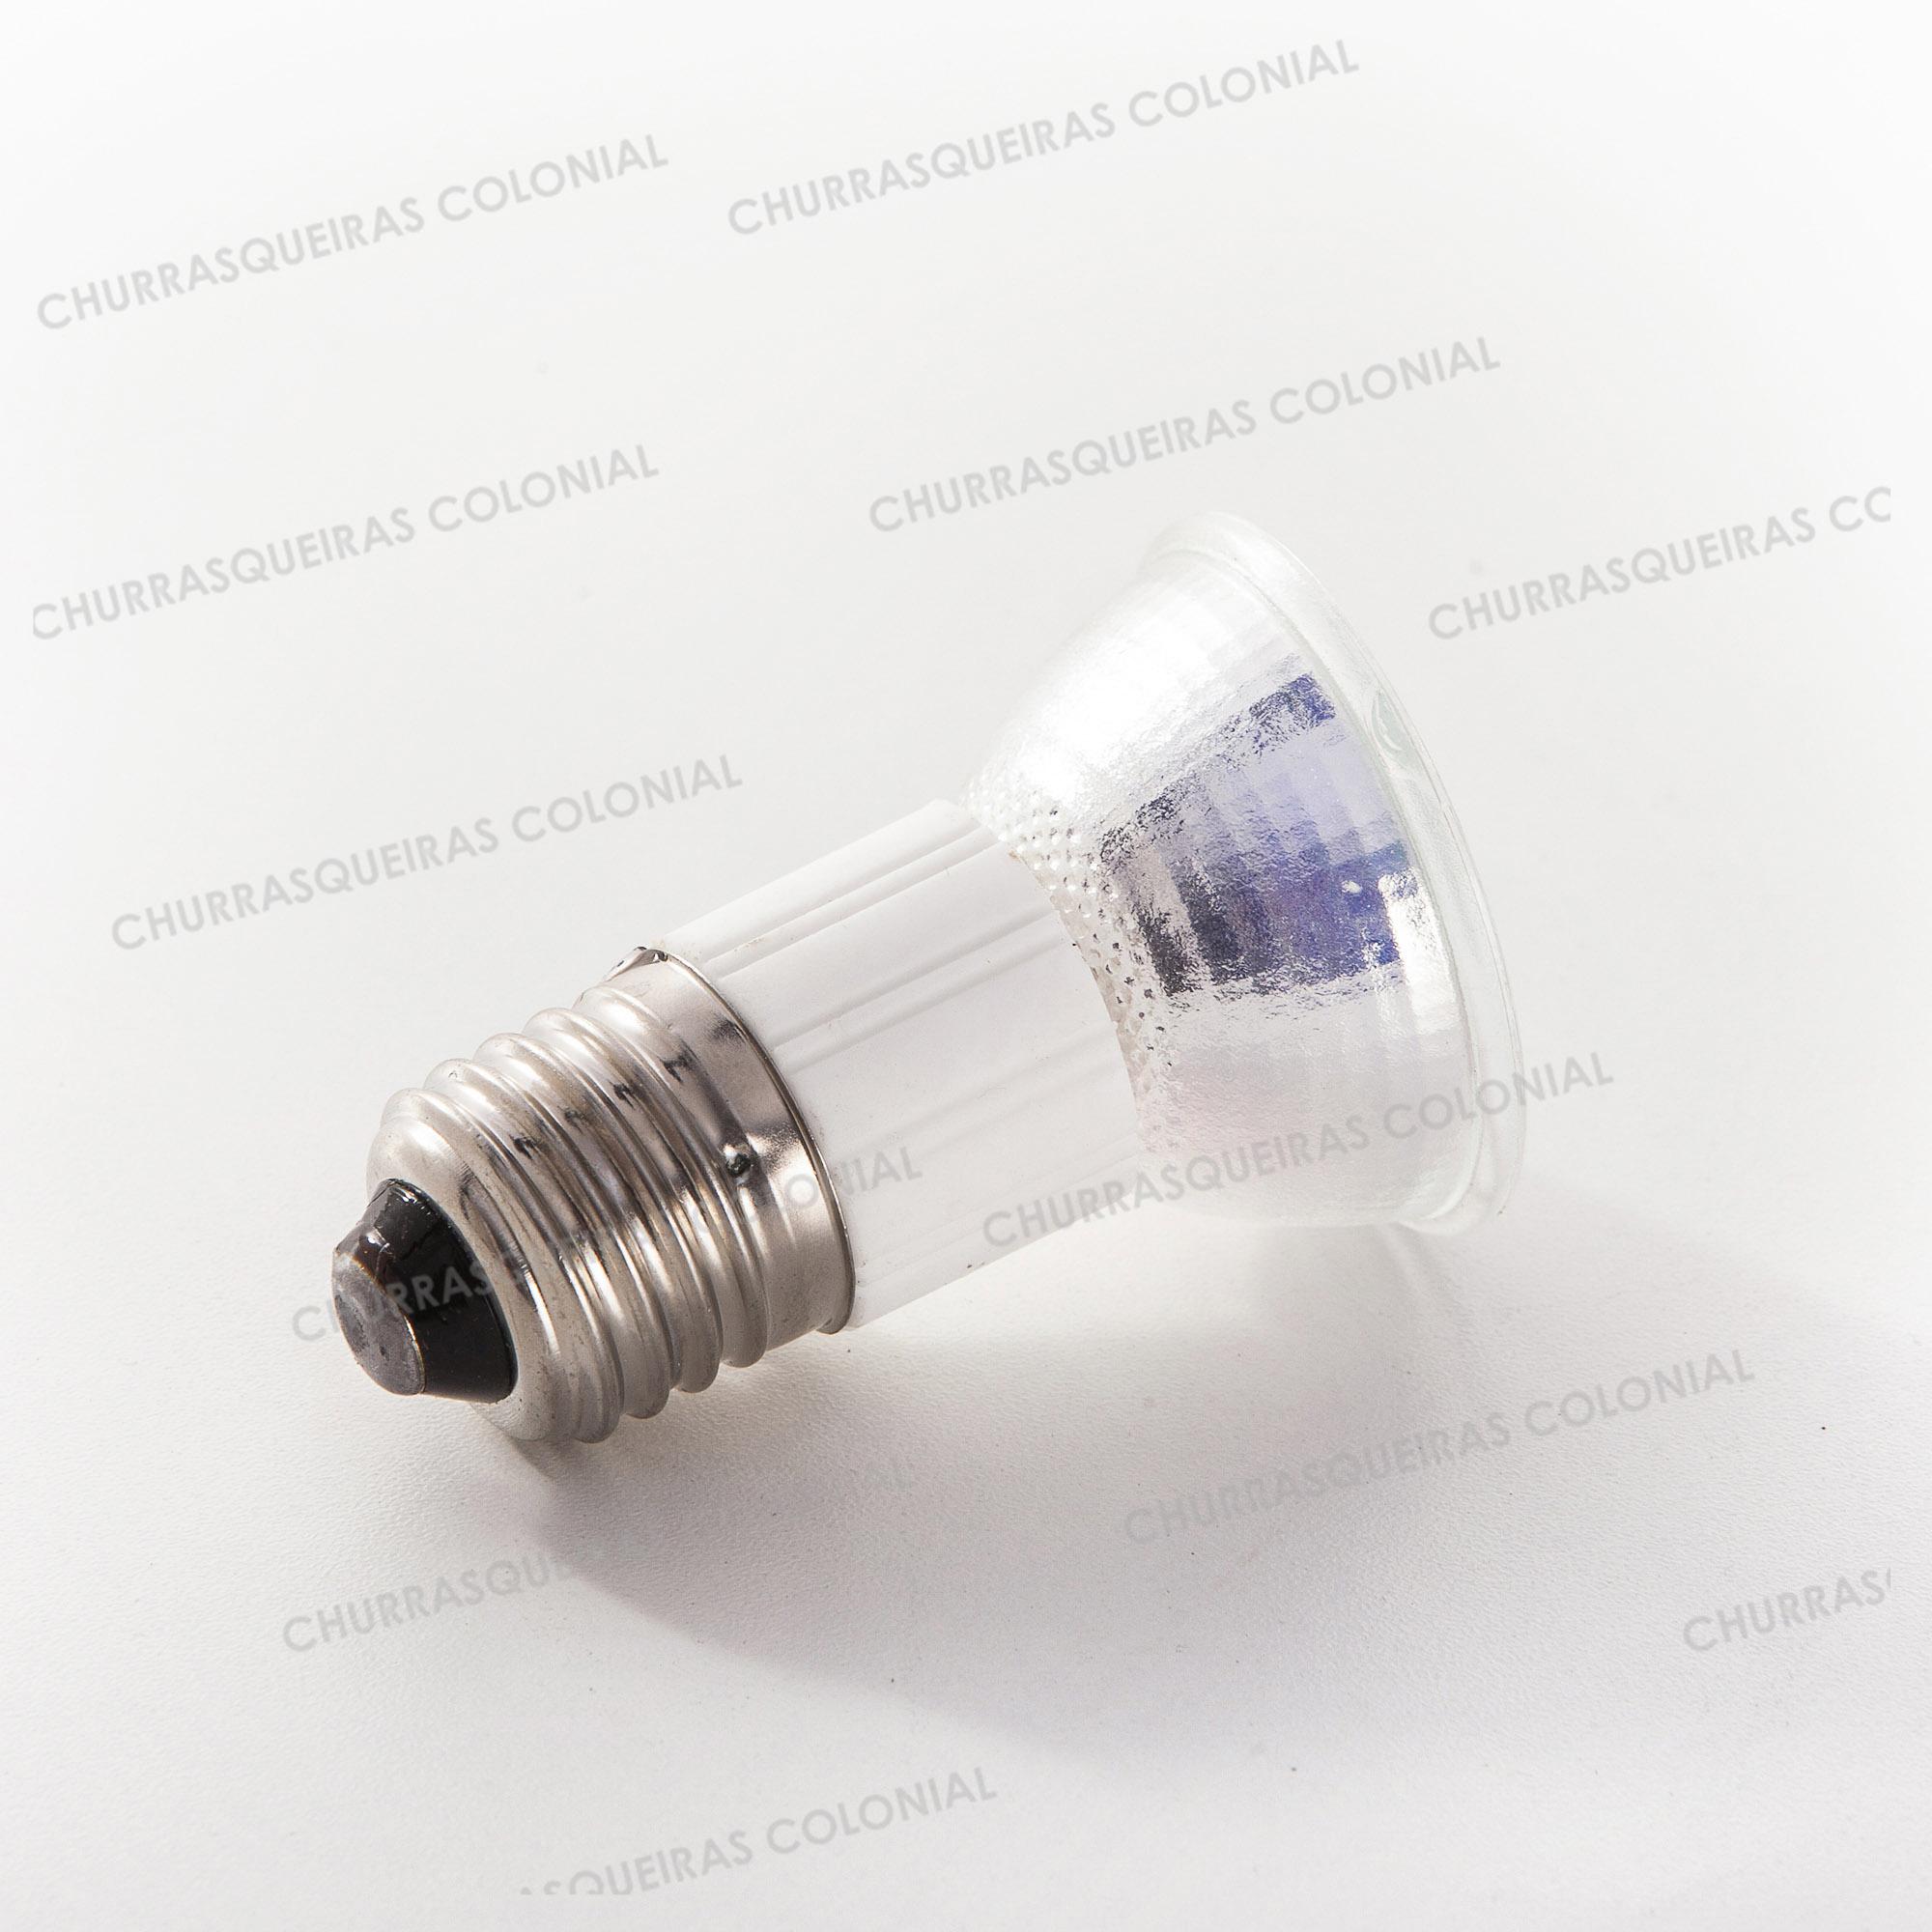 Lâmpada Dicróica JDR MR16 50 W 127 V